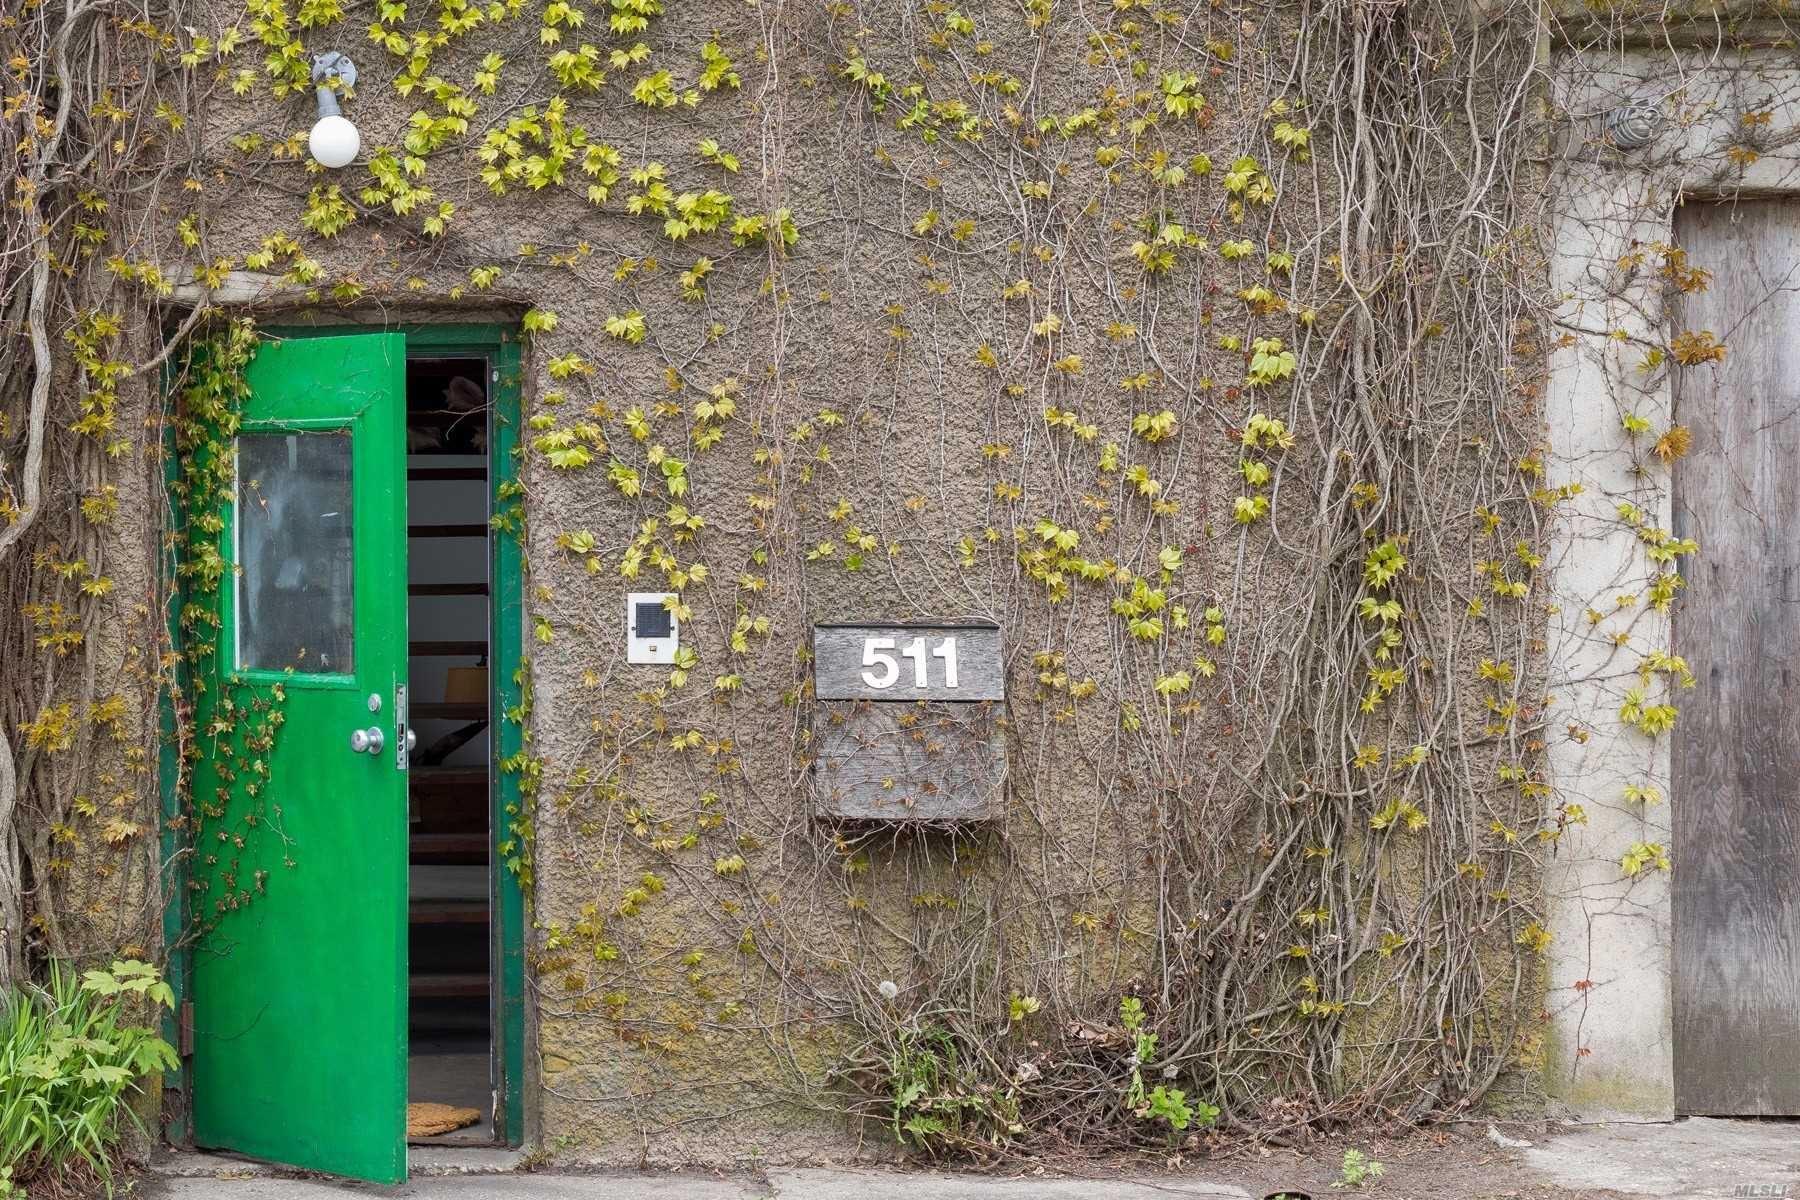 511 Carpenter St, Greenport, NY 11944 - MLS#: 3214997